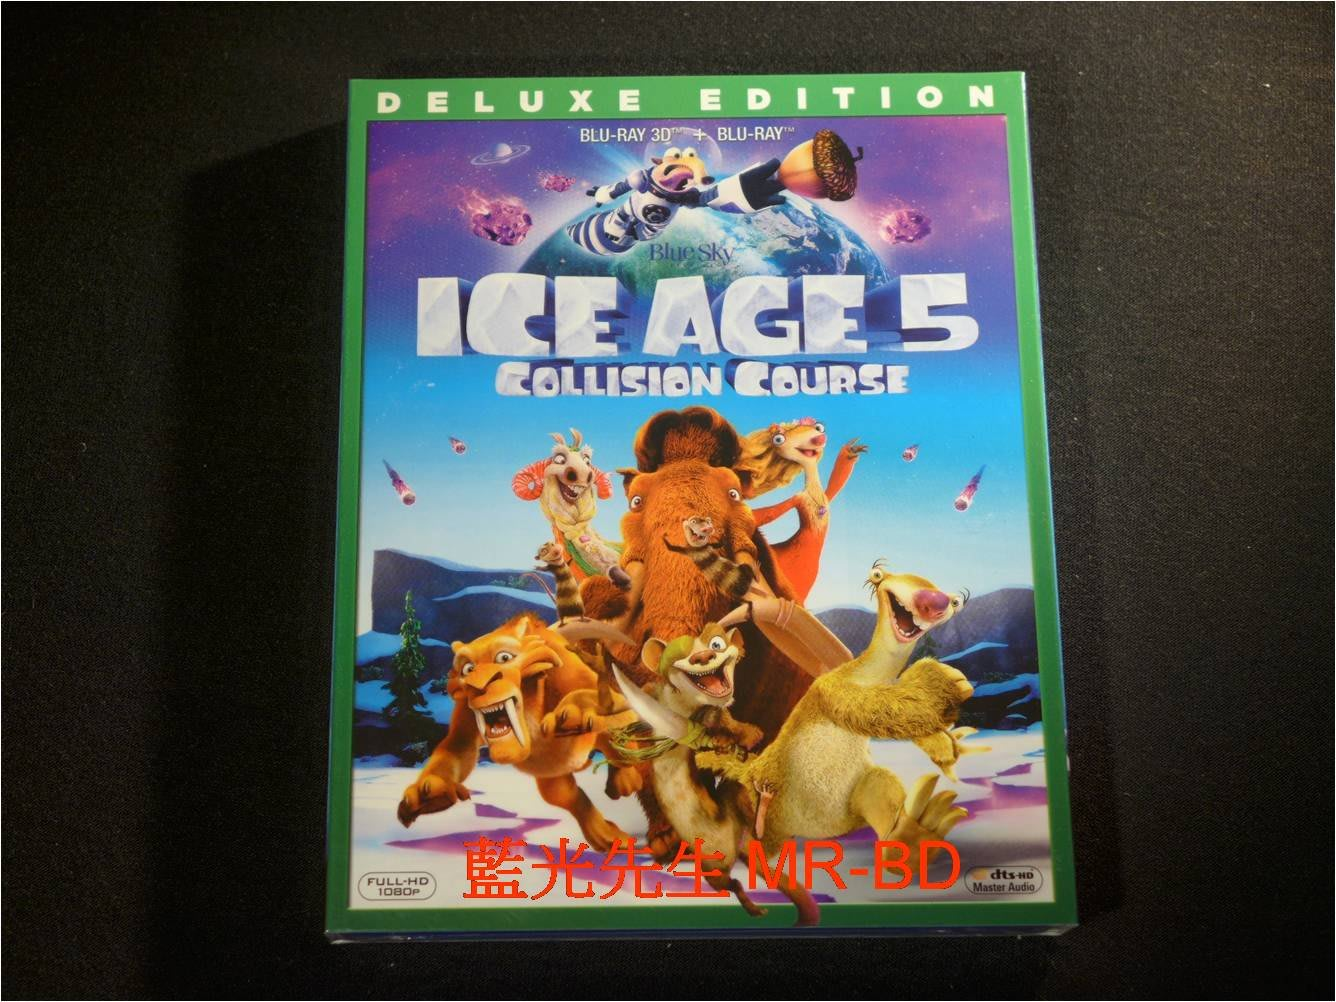 [3D藍光BD] -冰原歷險記5:笑星撞地球 Ice Age : Collision Course 3D+2D 雙碟限定版